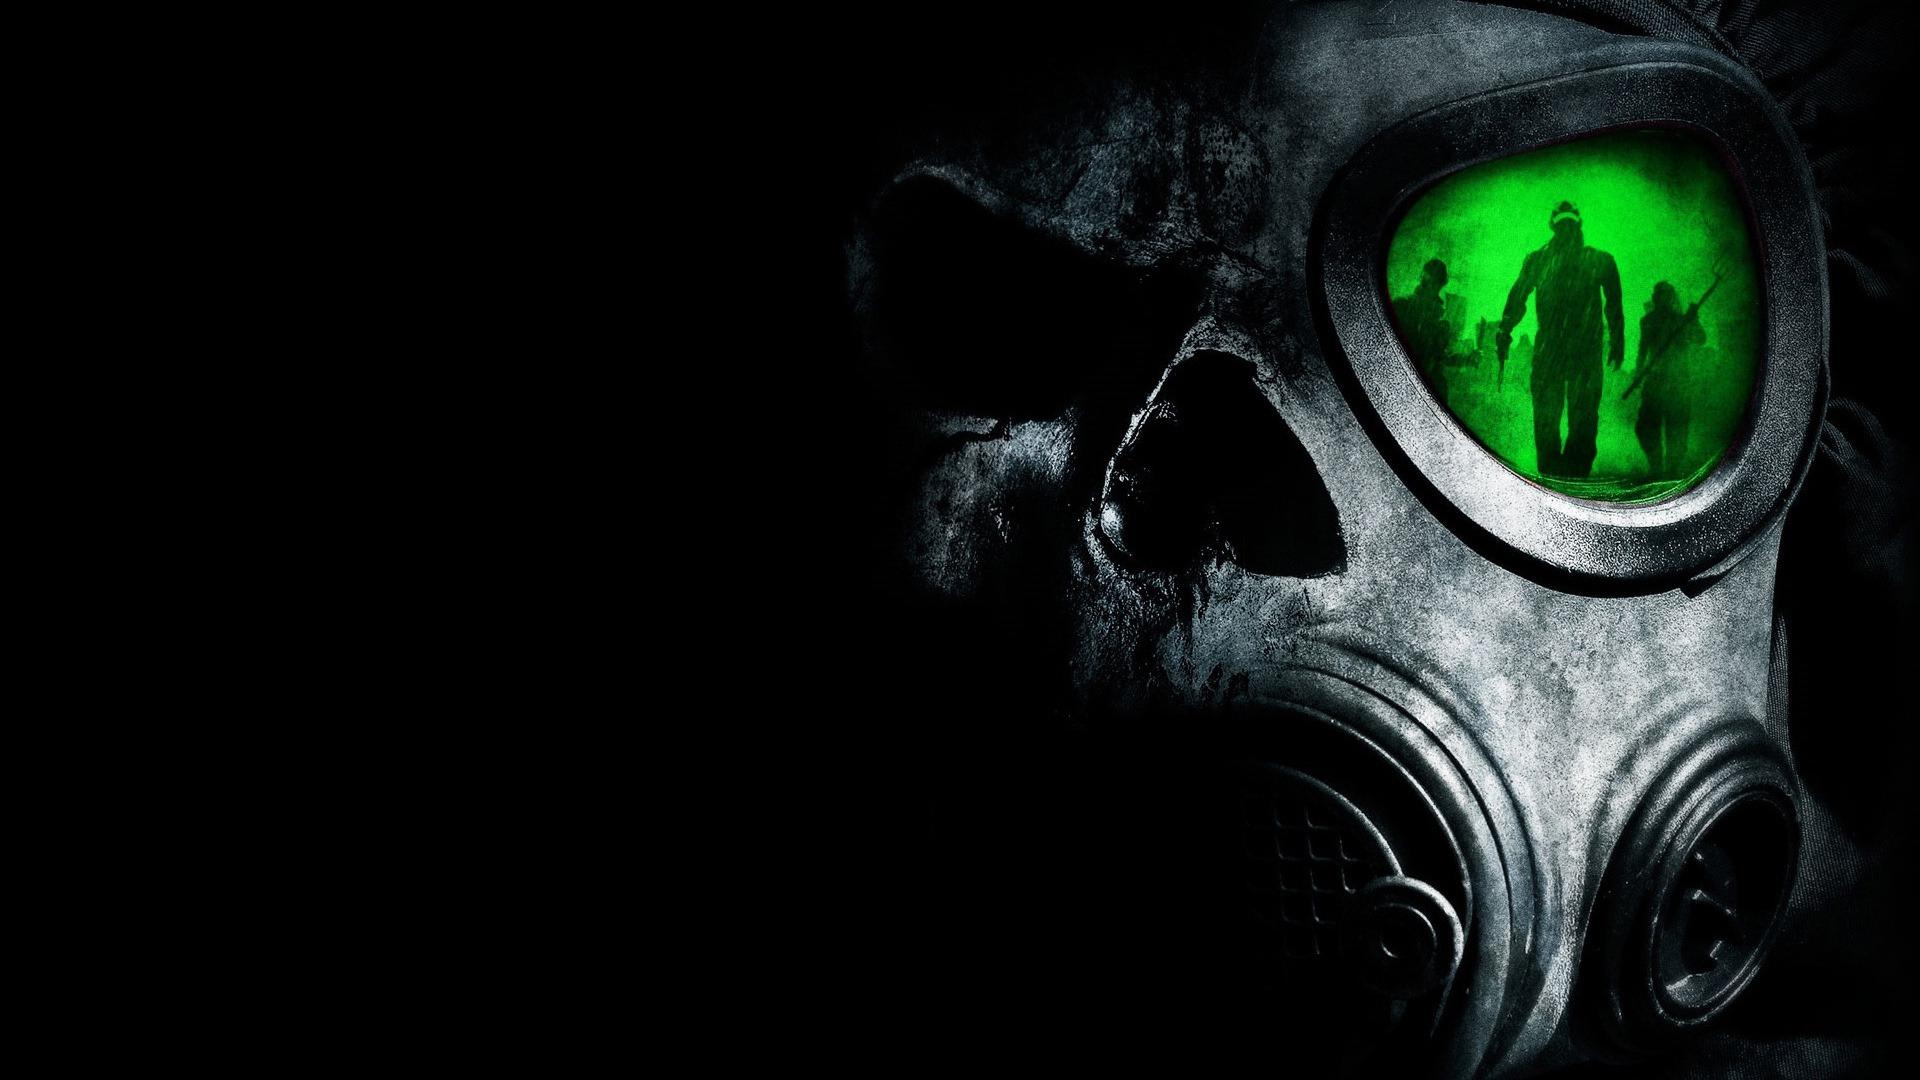 Green Biohazard Theme For Windows 7 Requirement Windows 7 1920x1080